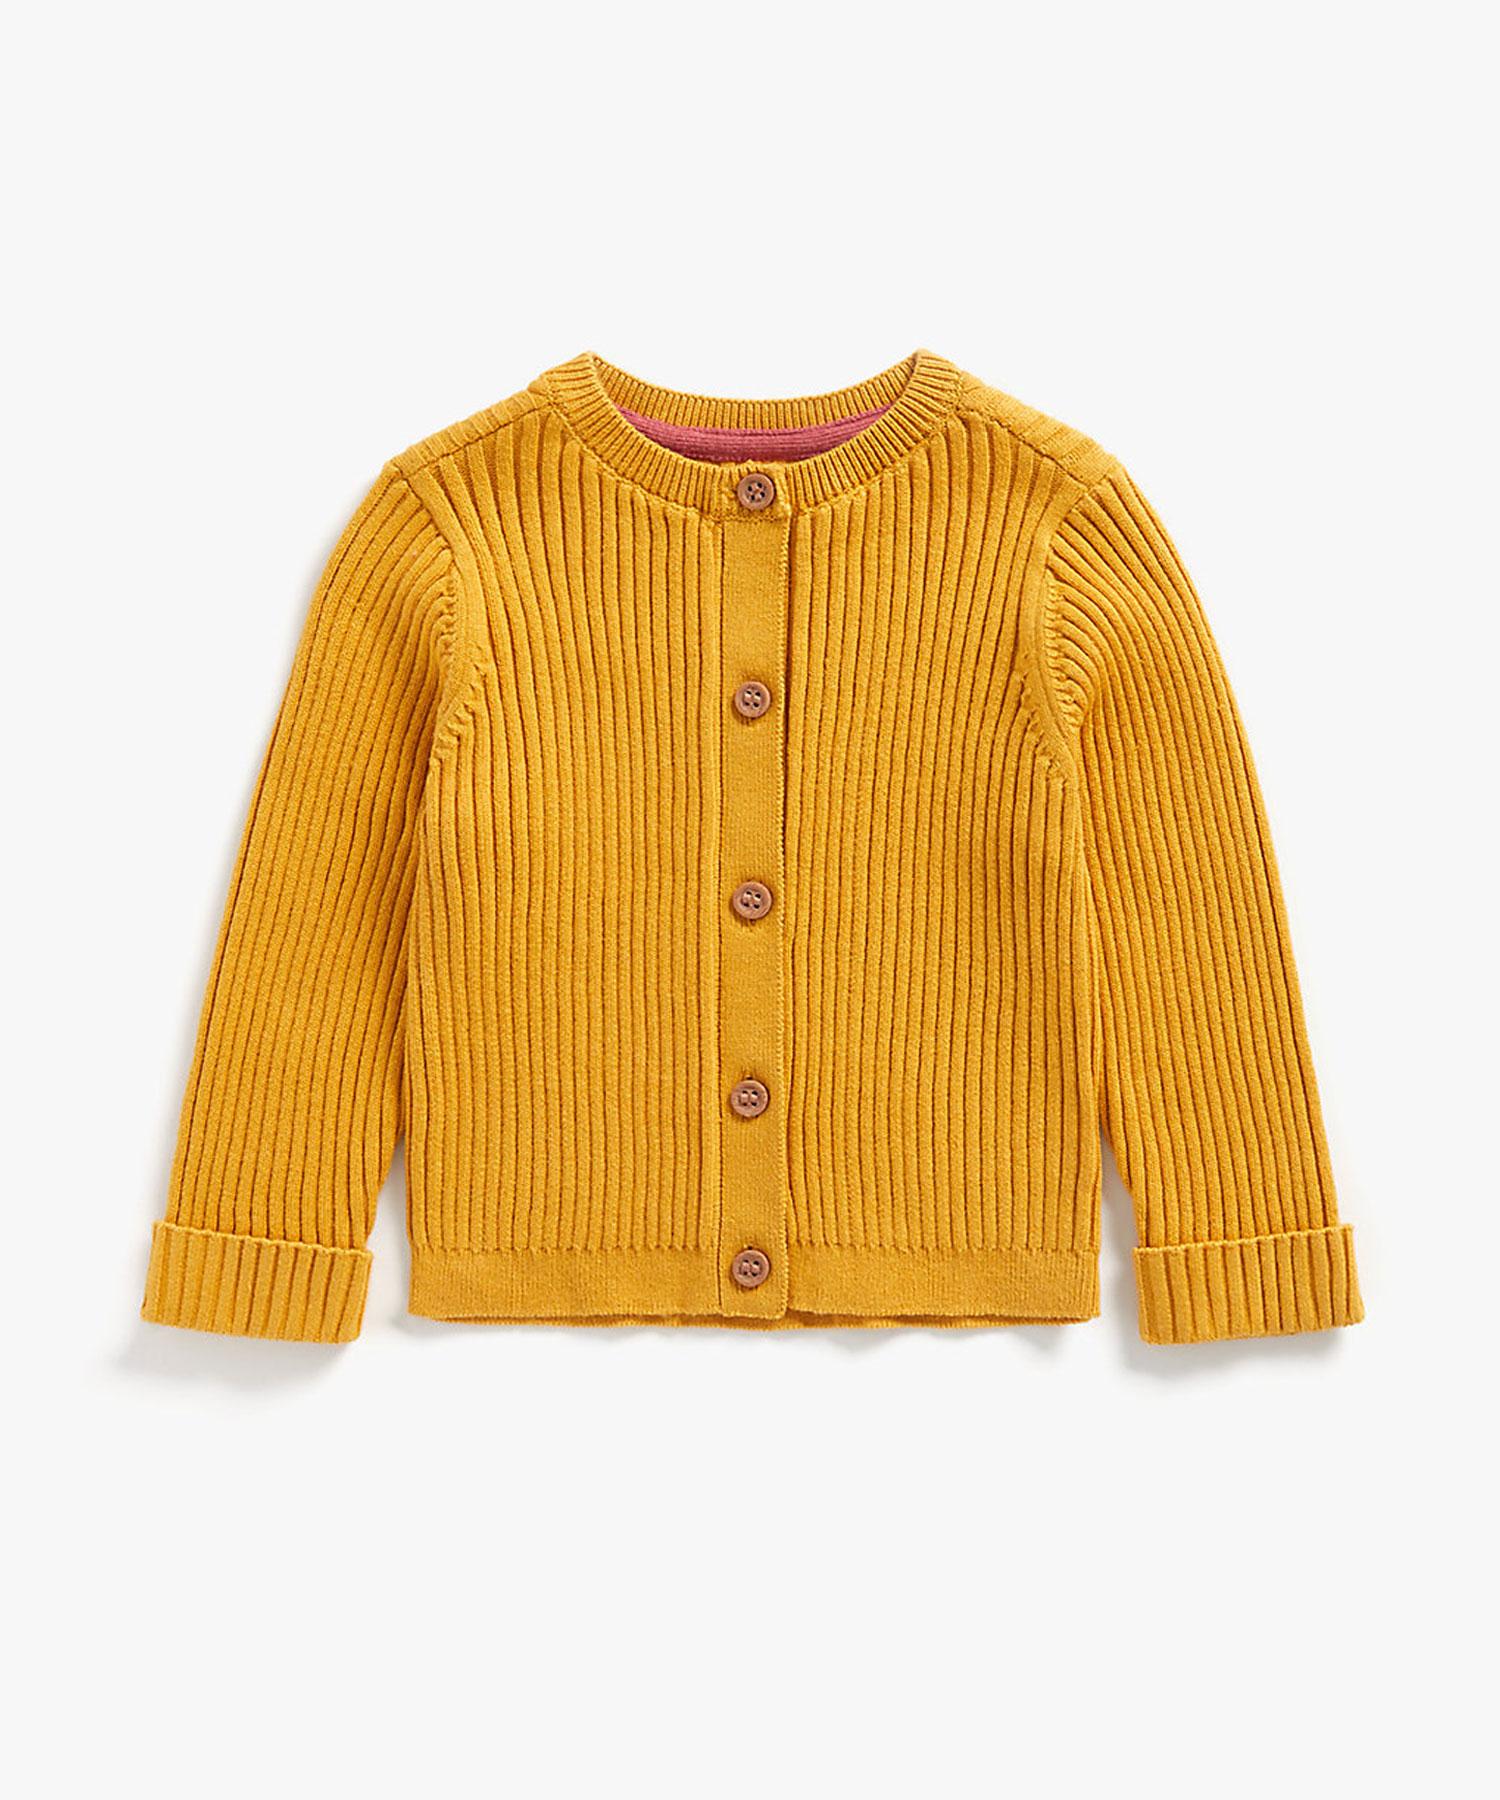 Mothercare | Girls Full Sleeves Ribbed Cardigan - Mustard